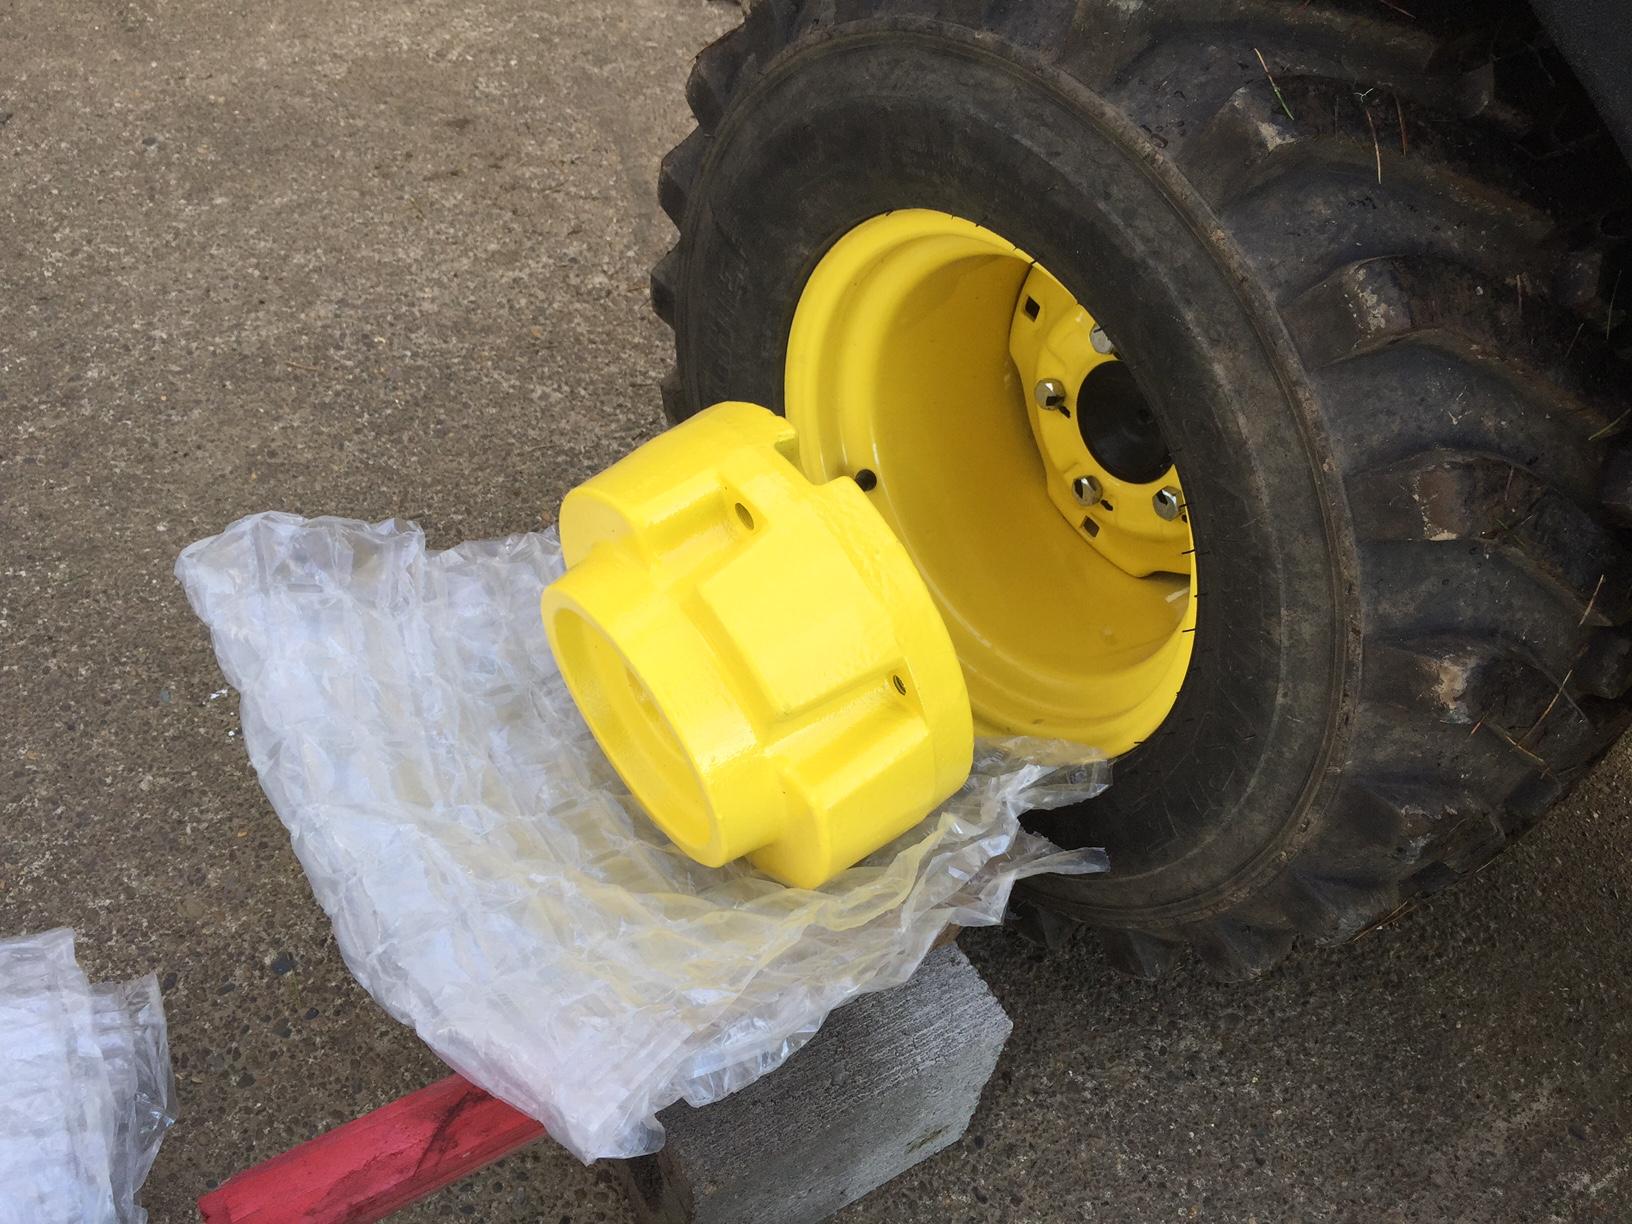 John Deere Rear Wheel Spacers : Any suggertions for installing rear wheel starter weights